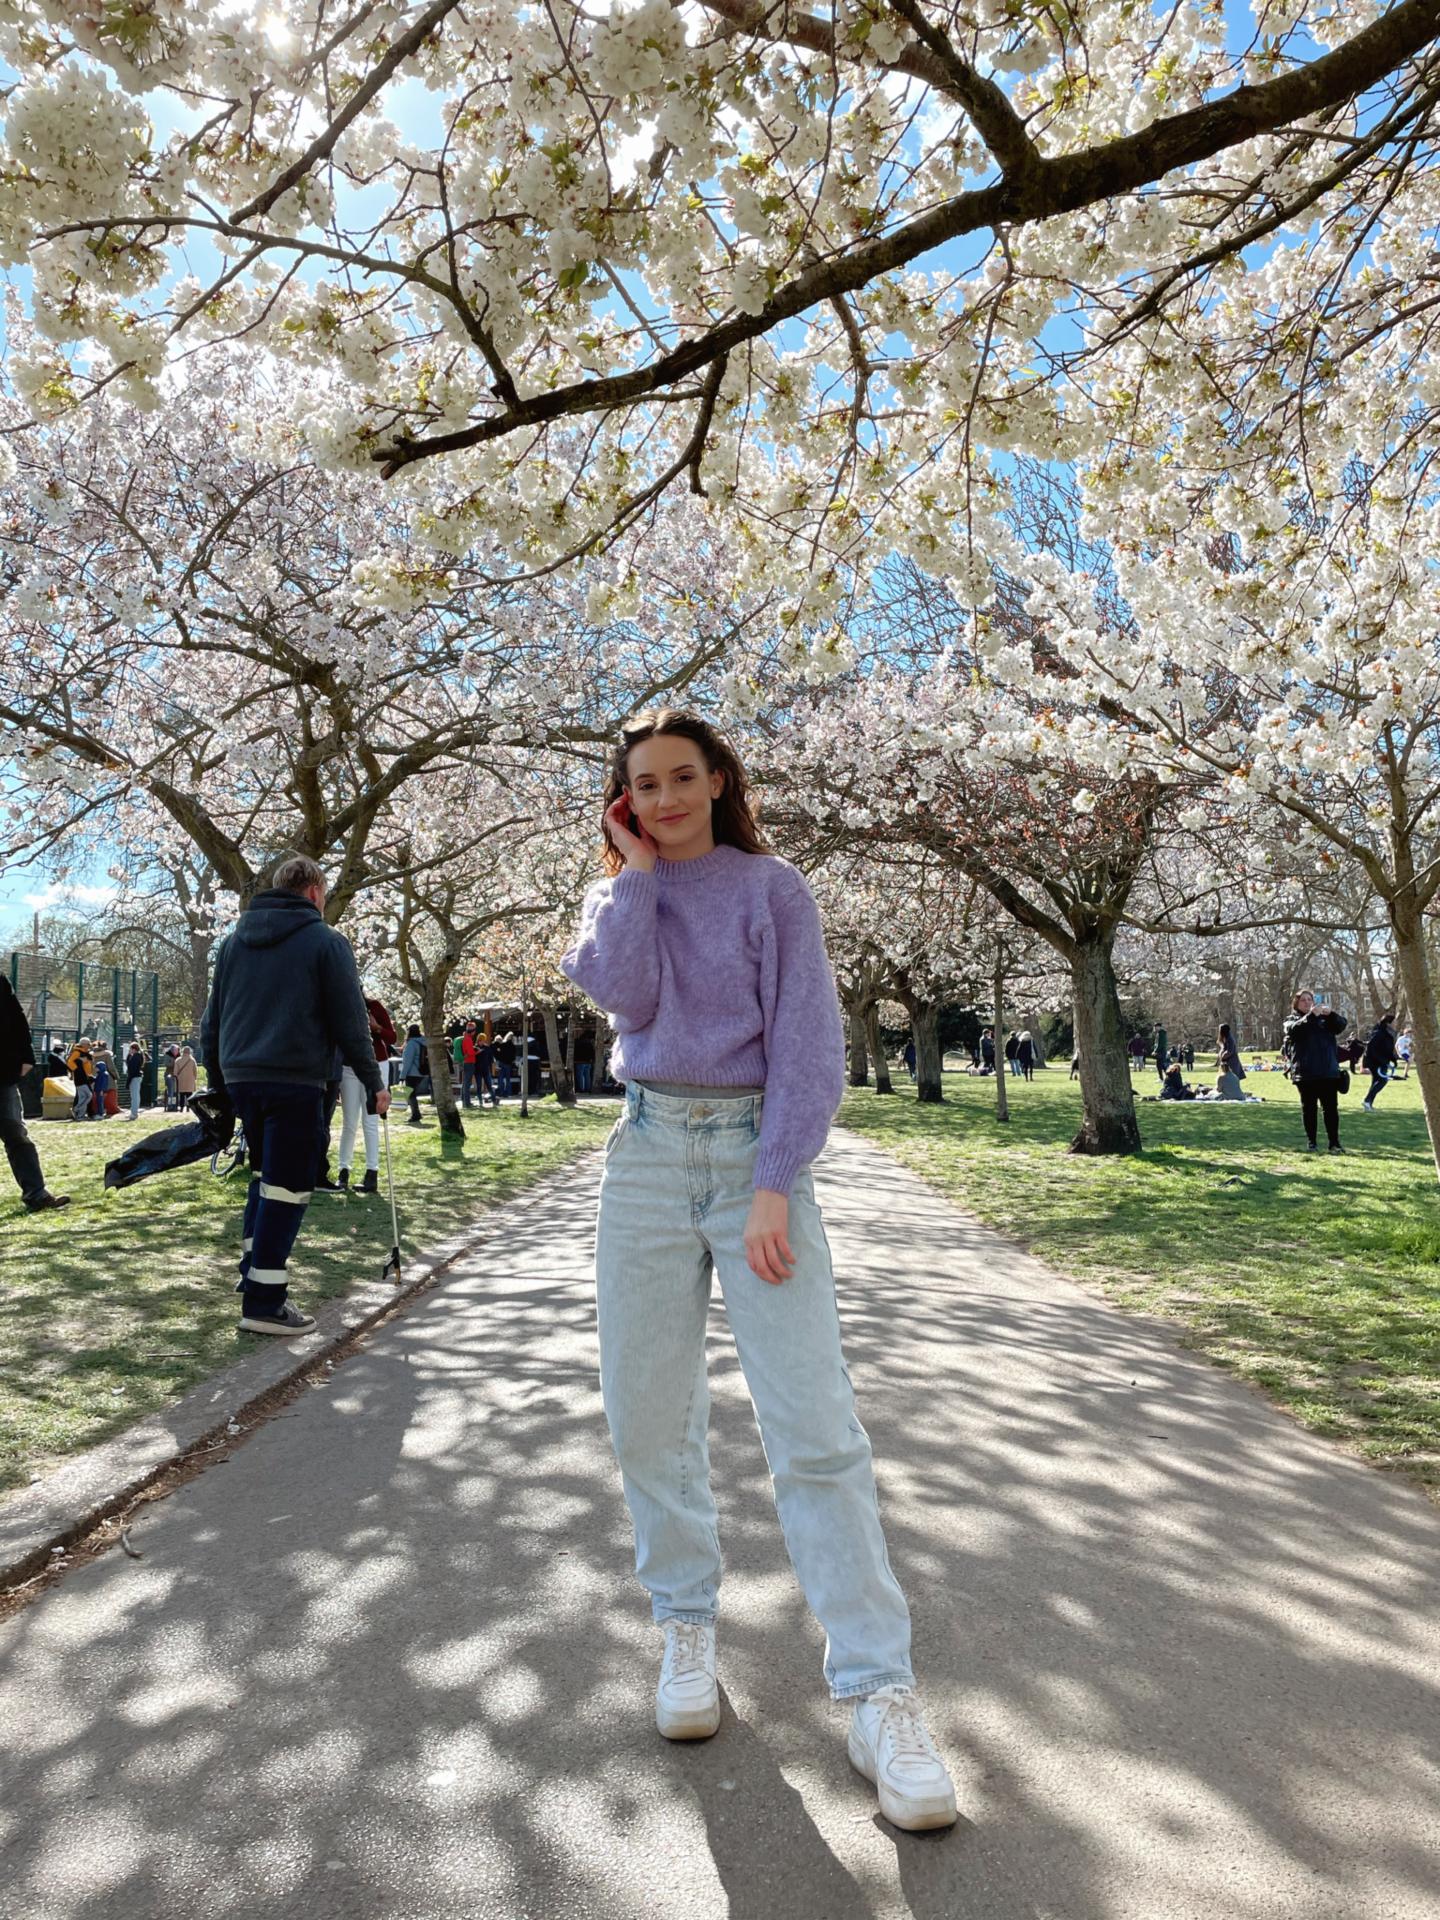 Girl in baggy jeans in park